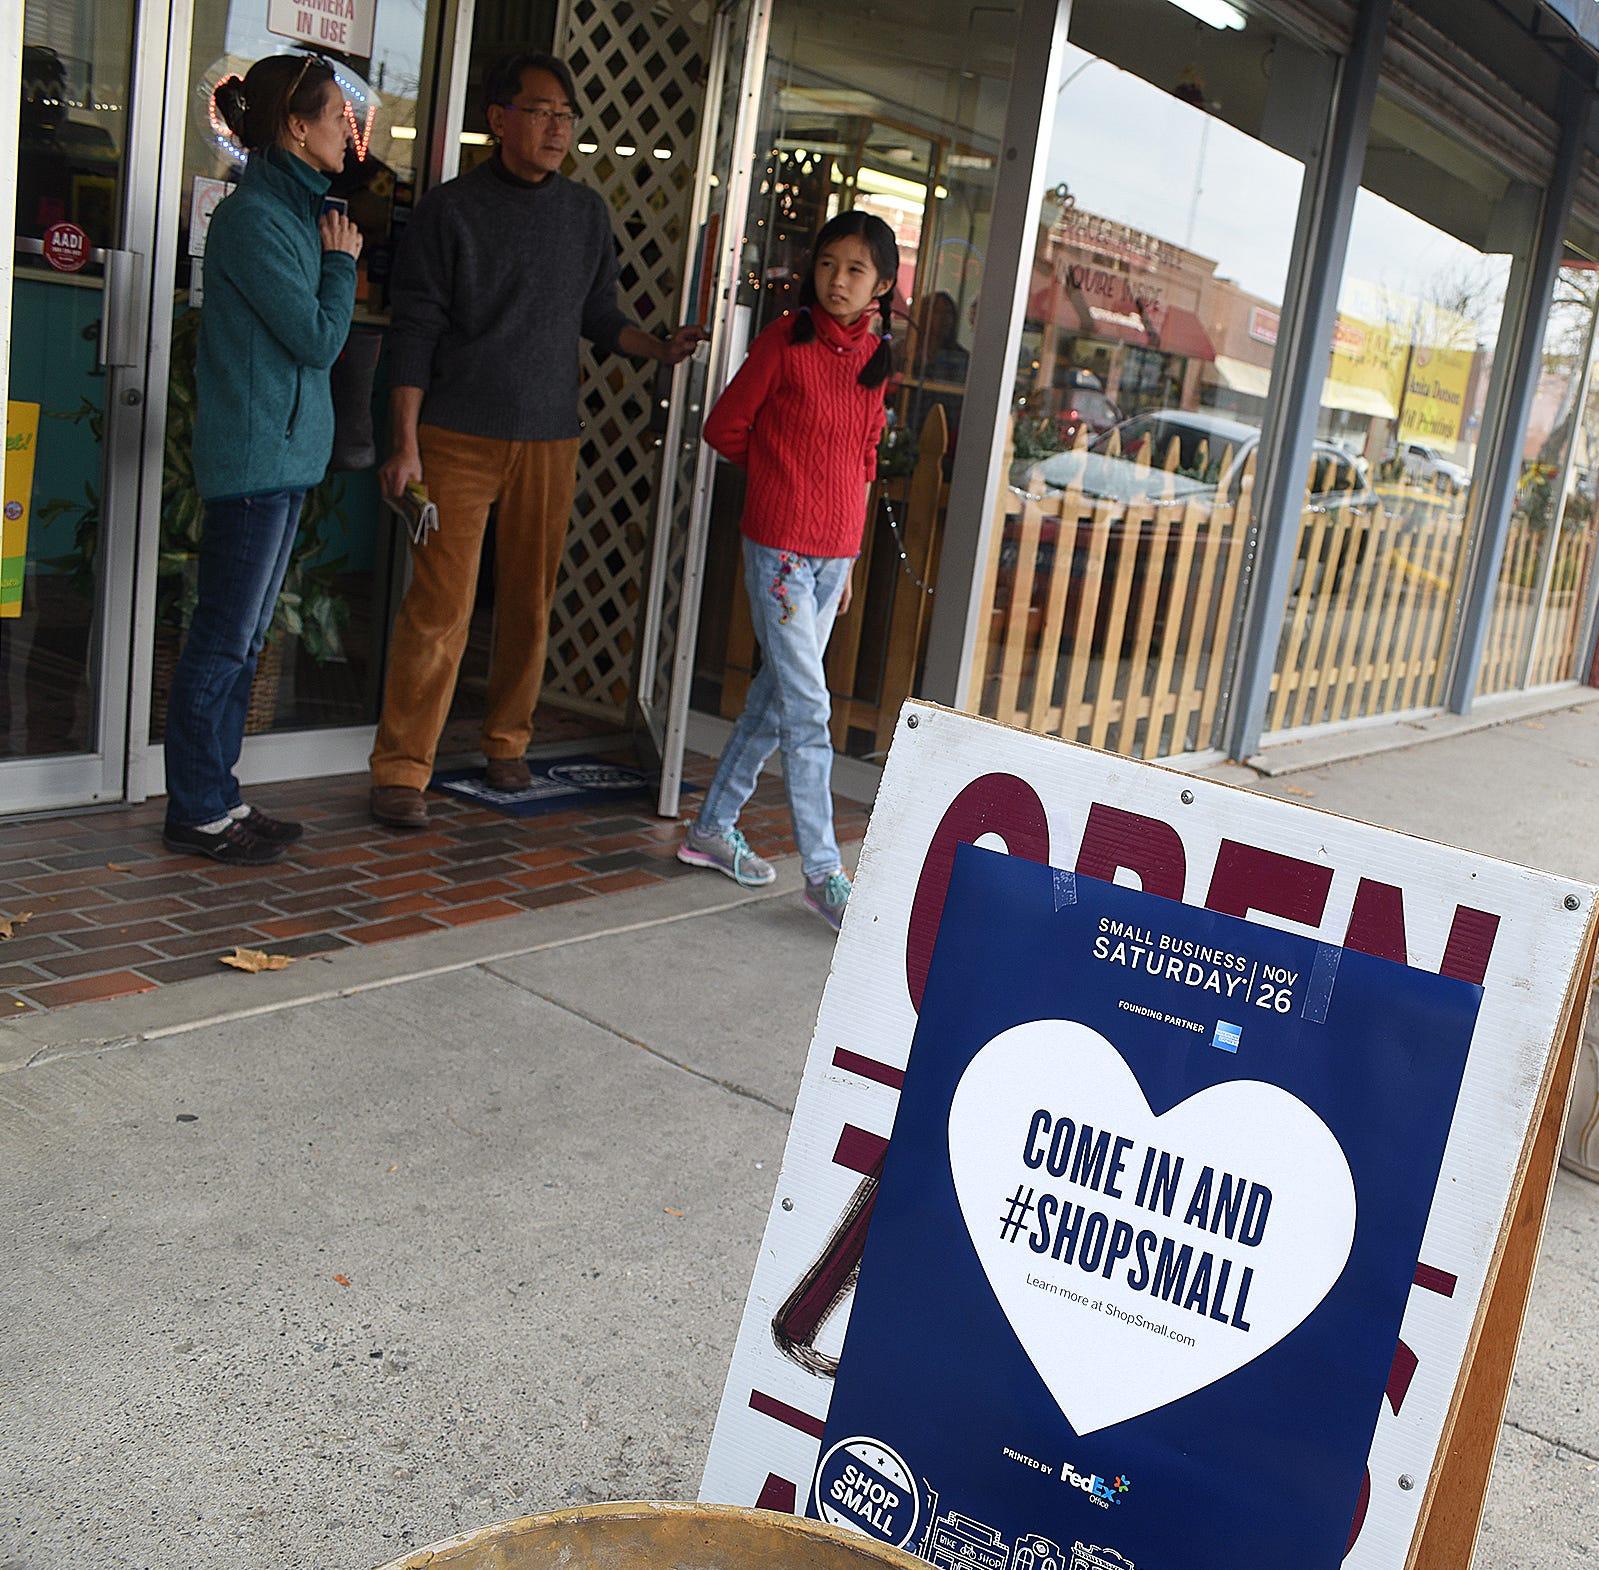 Small Business Saturday returns to downtown Farmington